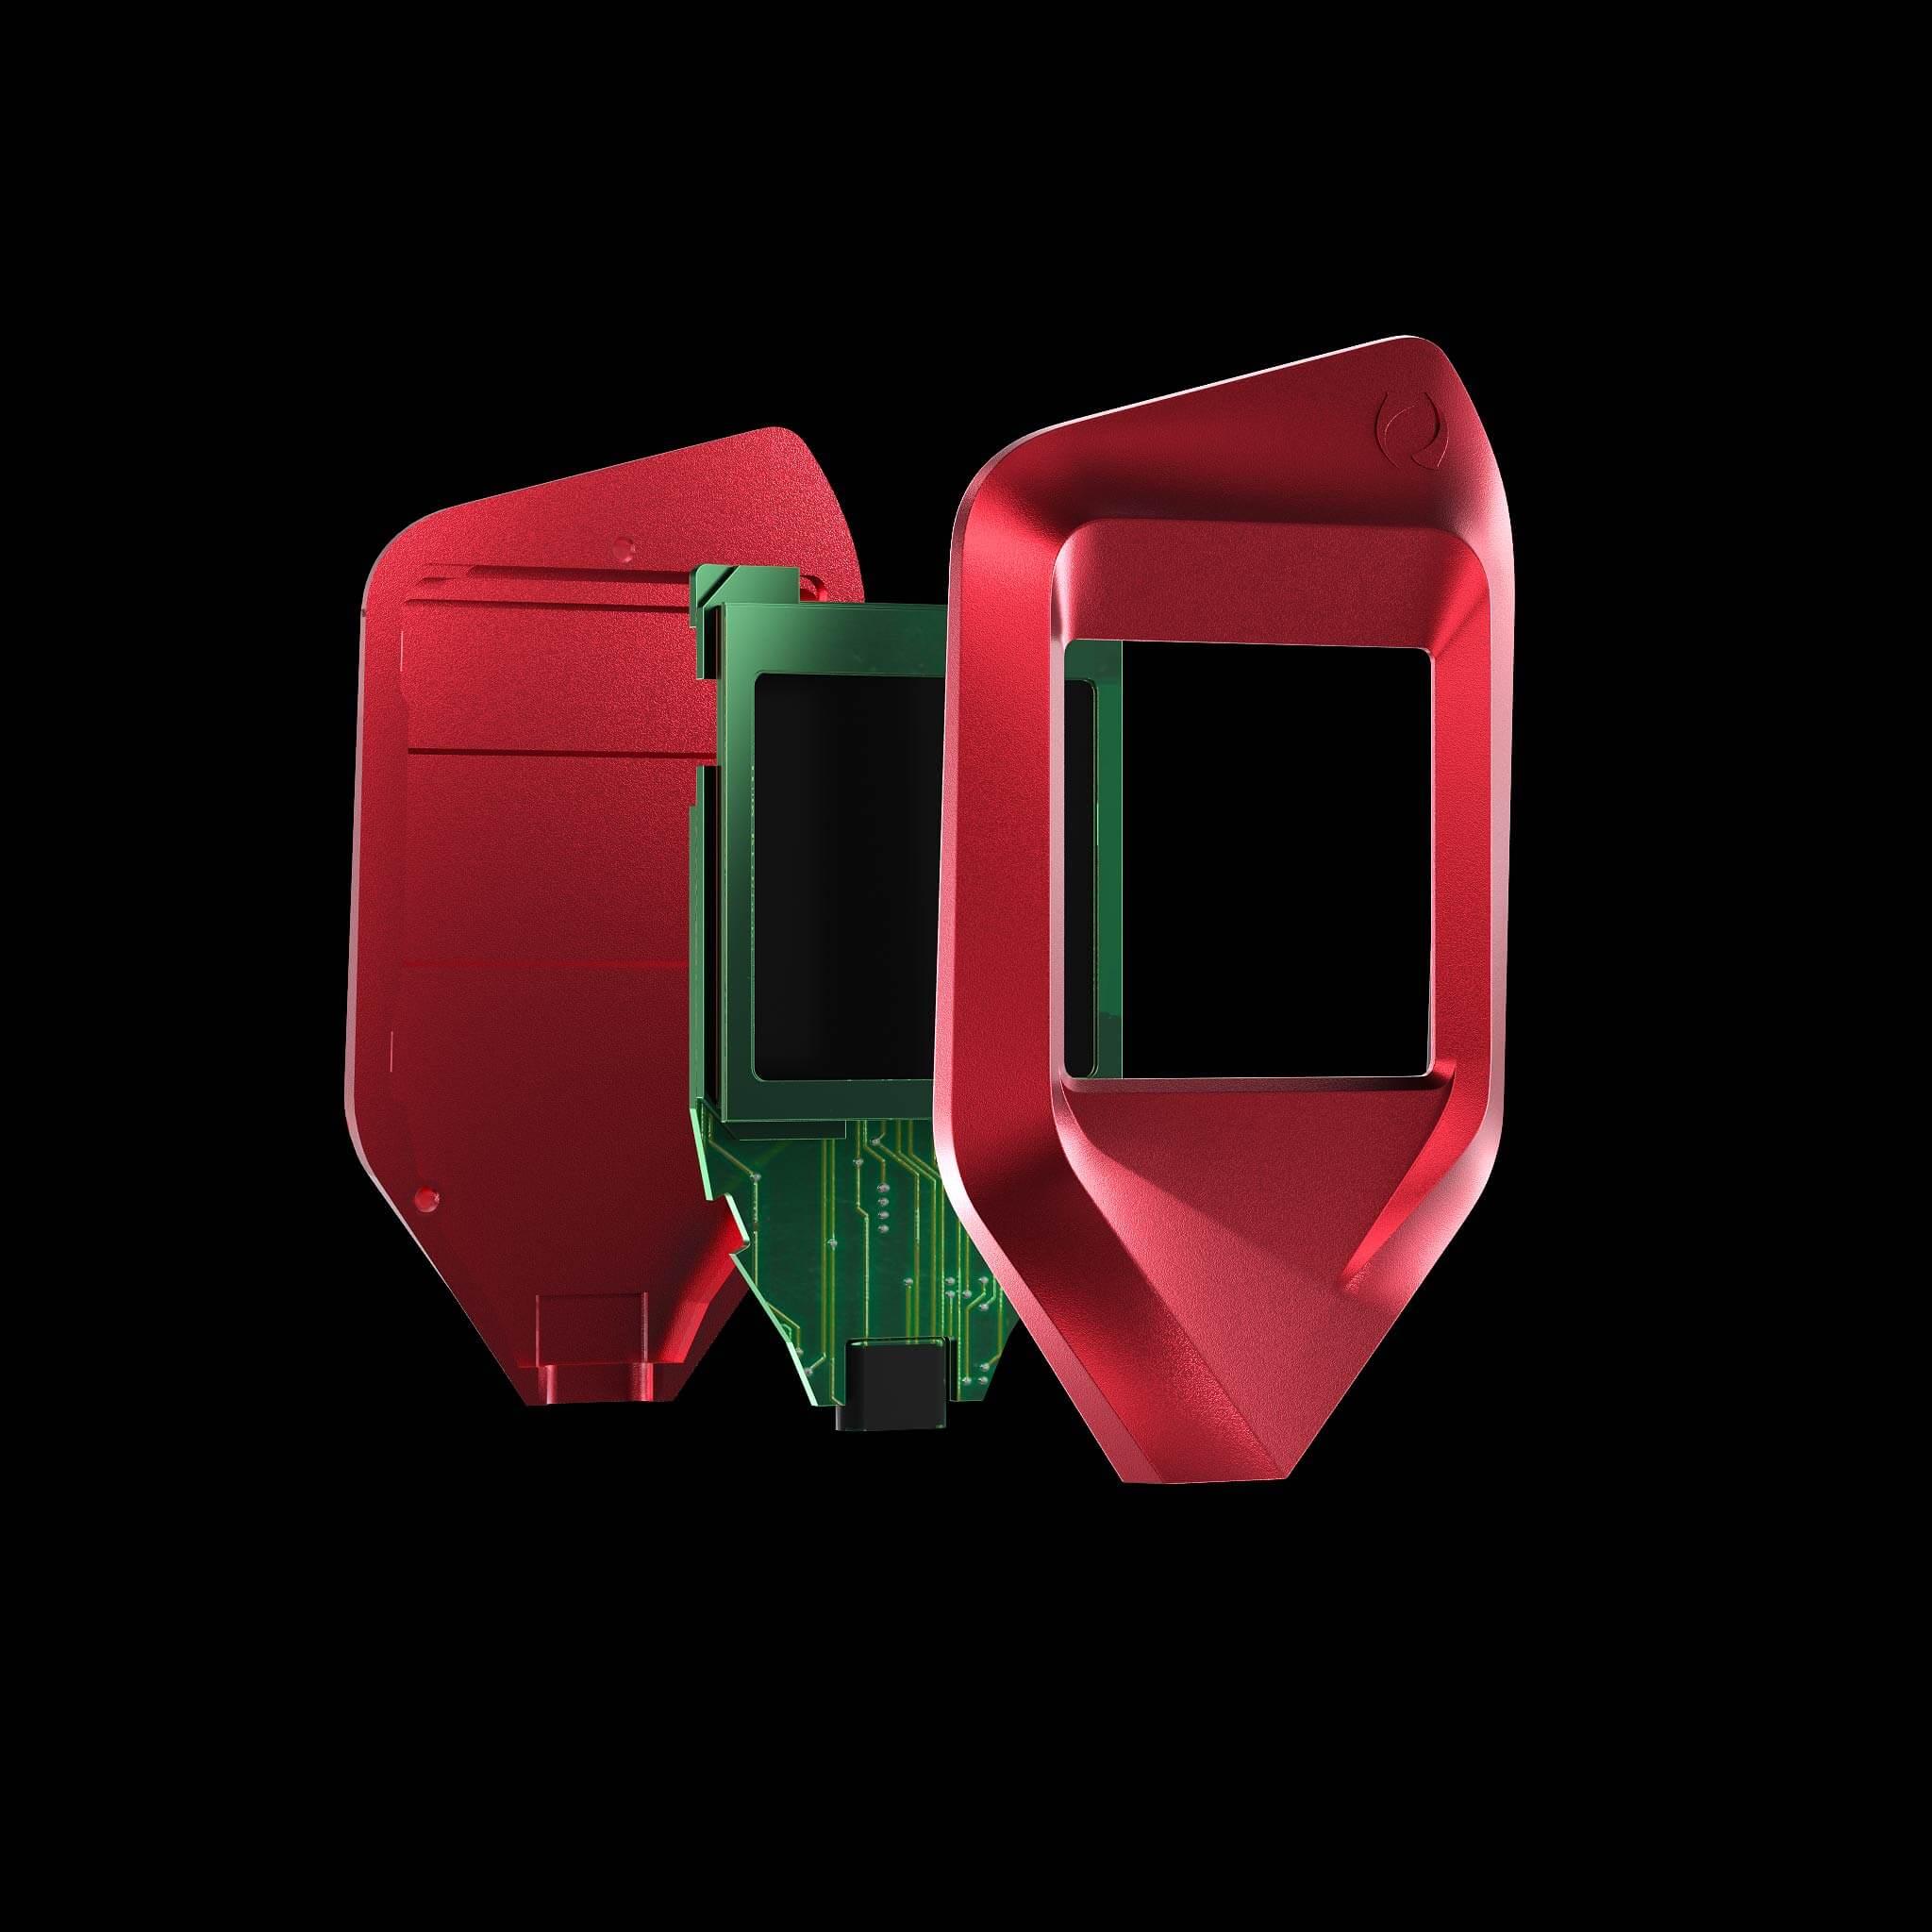 corazon red trezor model t crypto wallet